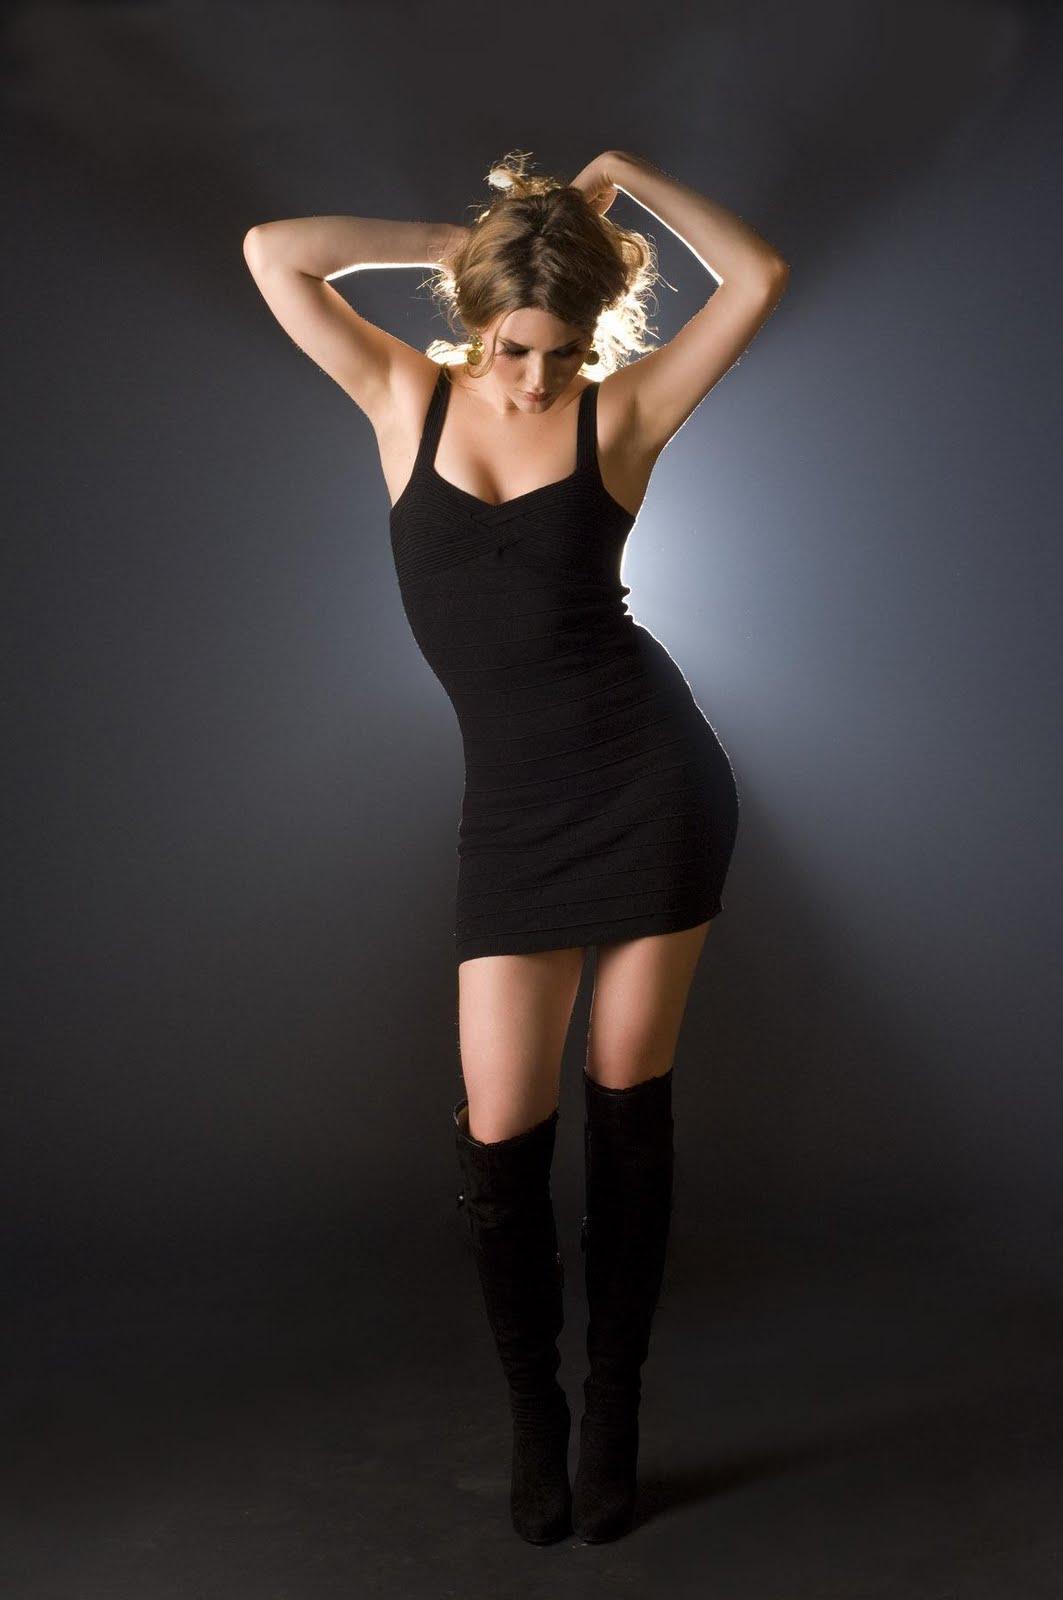 http://2.bp.blogspot.com/_BpAoKRSdVjQ/TLc8GAgwhzI/AAAAAAAACDs/c9mB-mTdh40/s1600/joss-stone-celebrity.jpg